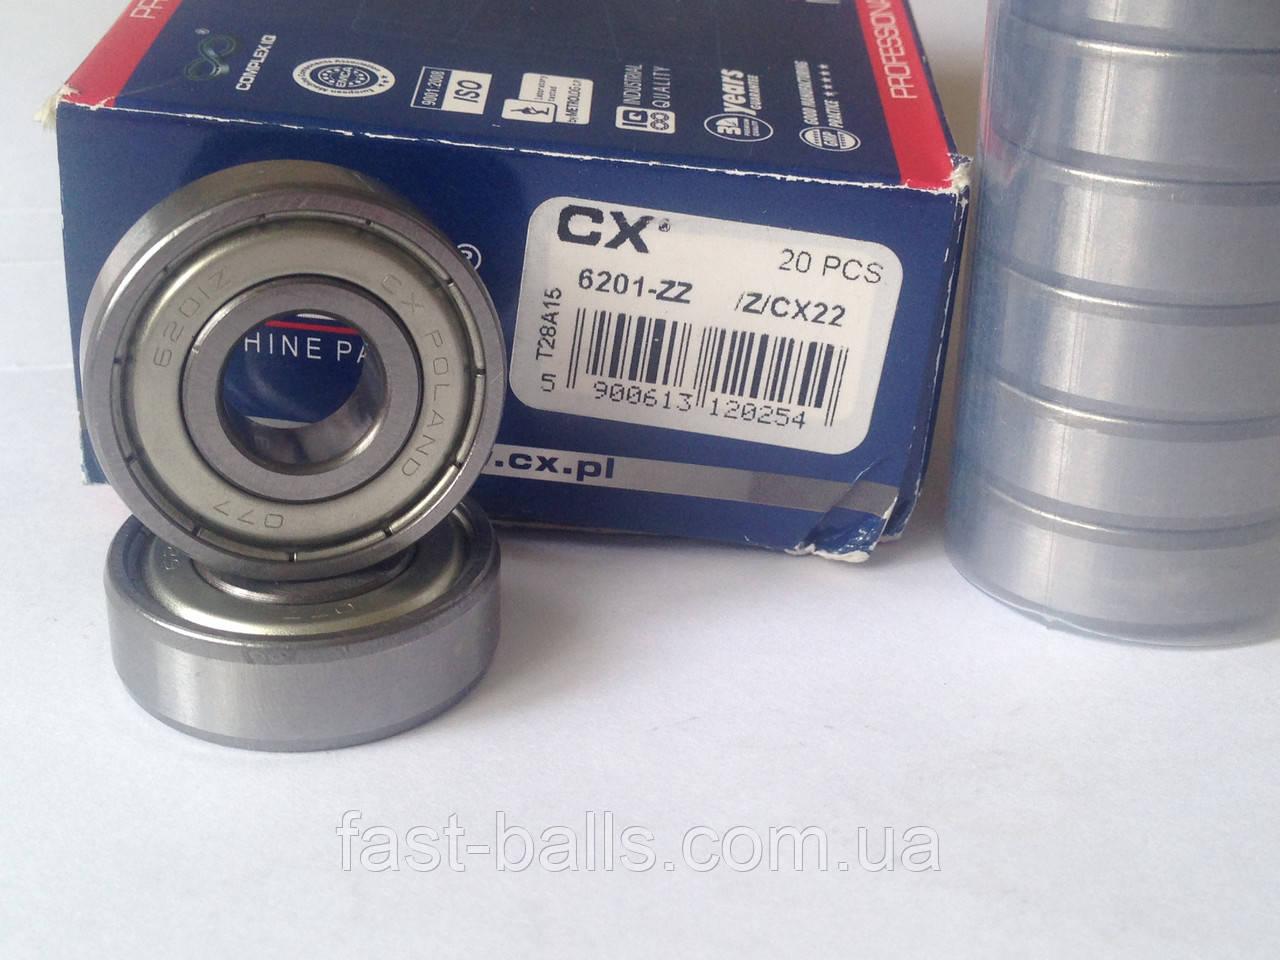 Однорядный подшипник CX 6201 2Z (12х32х10) - ФОП Танана А.В. в Киеве